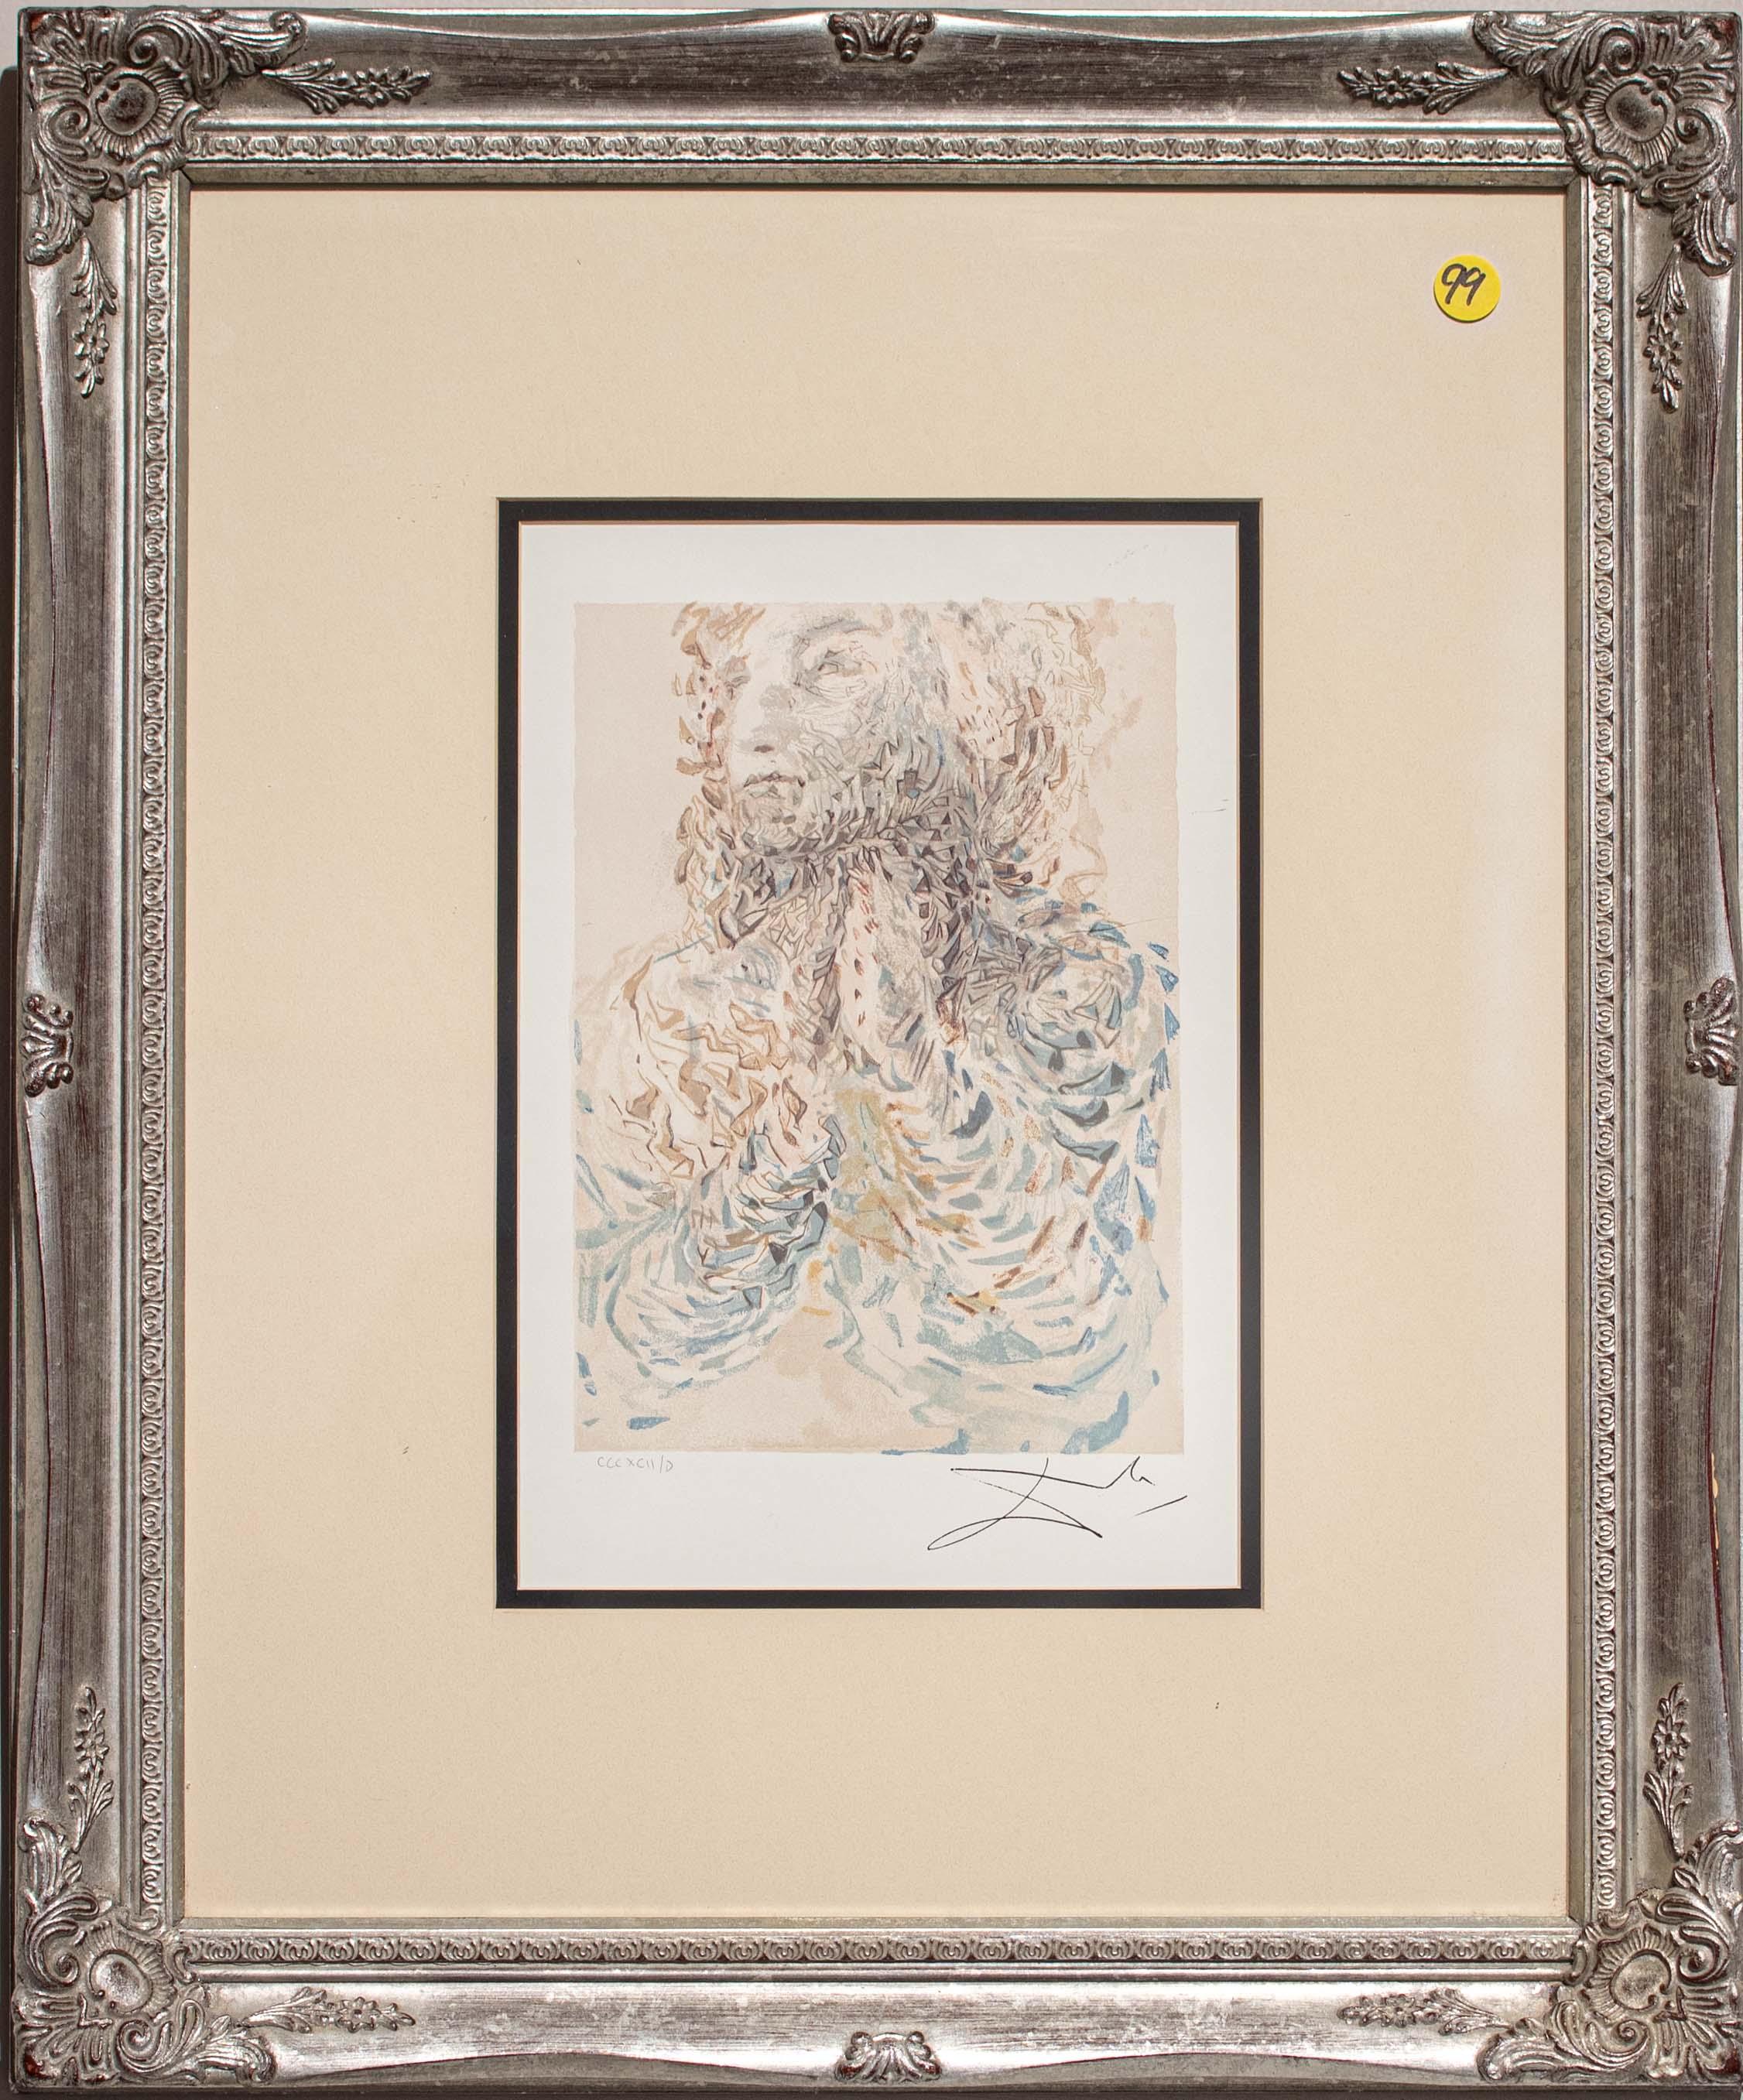 99. Salvador Dali